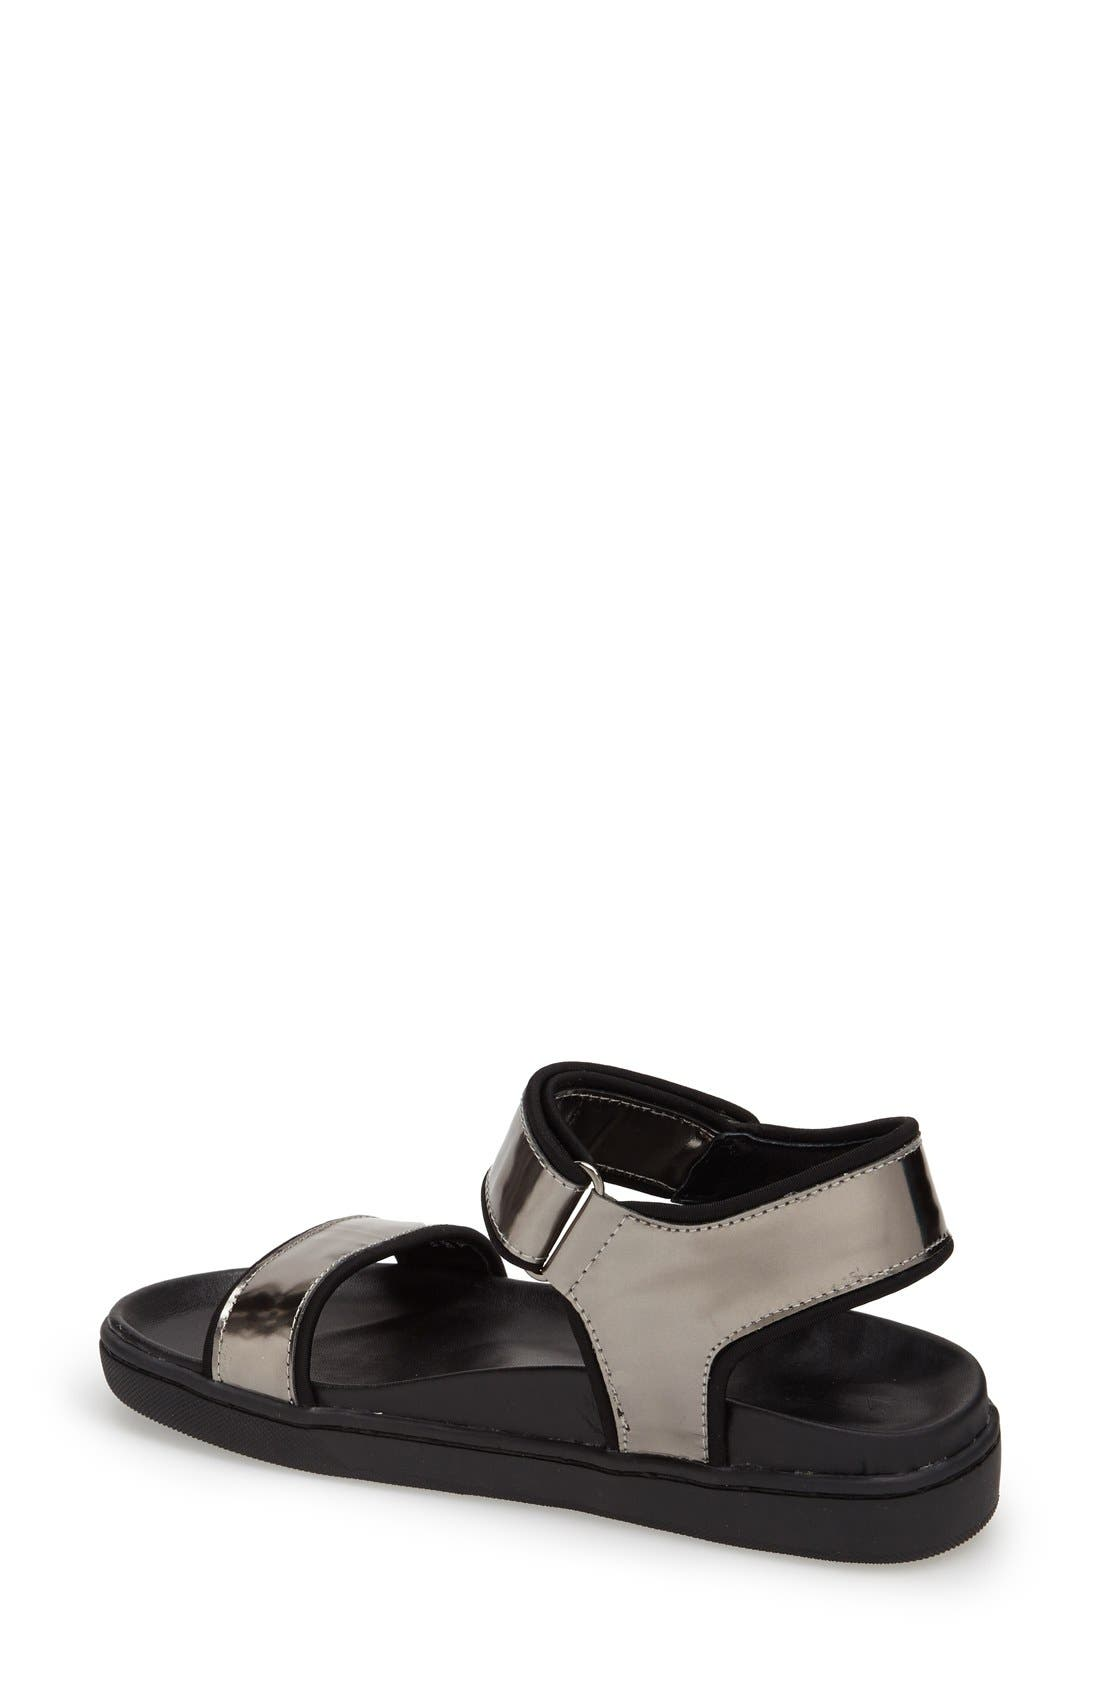 Alternate Image 2  - Ateljé 71 'Astra' Two Strap Sandal (Women)